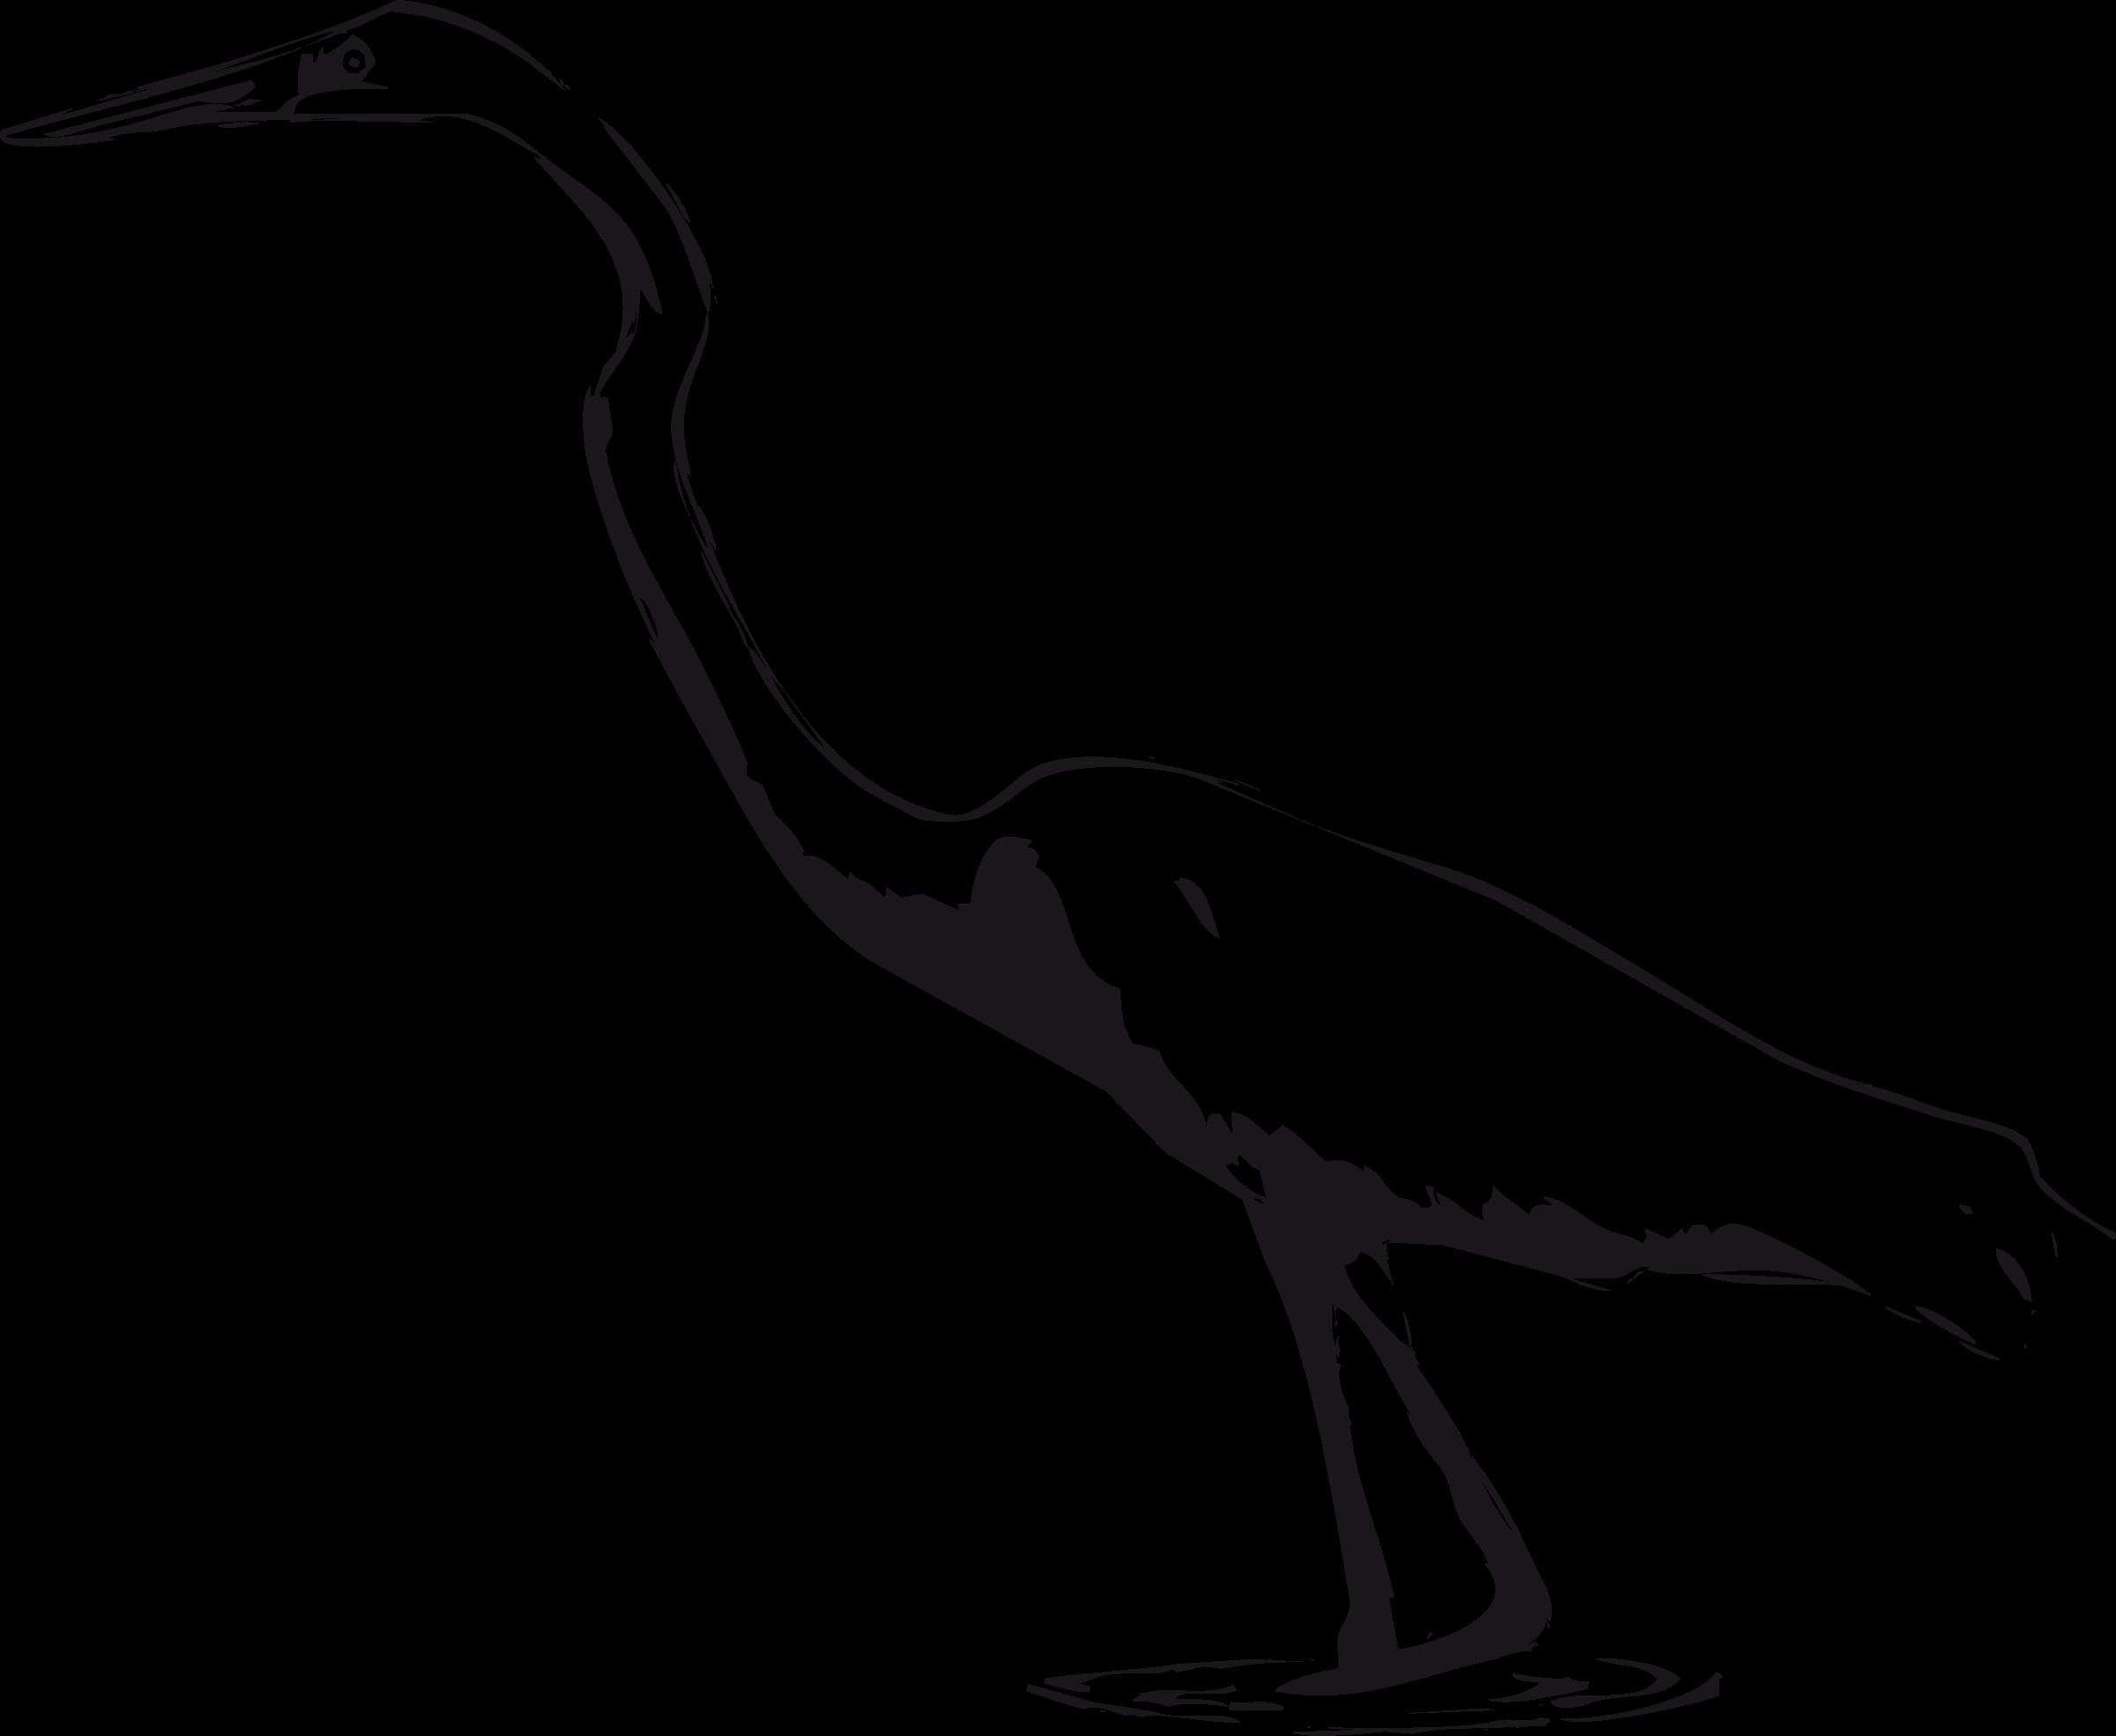 Great egret big image. Crane clipart animal